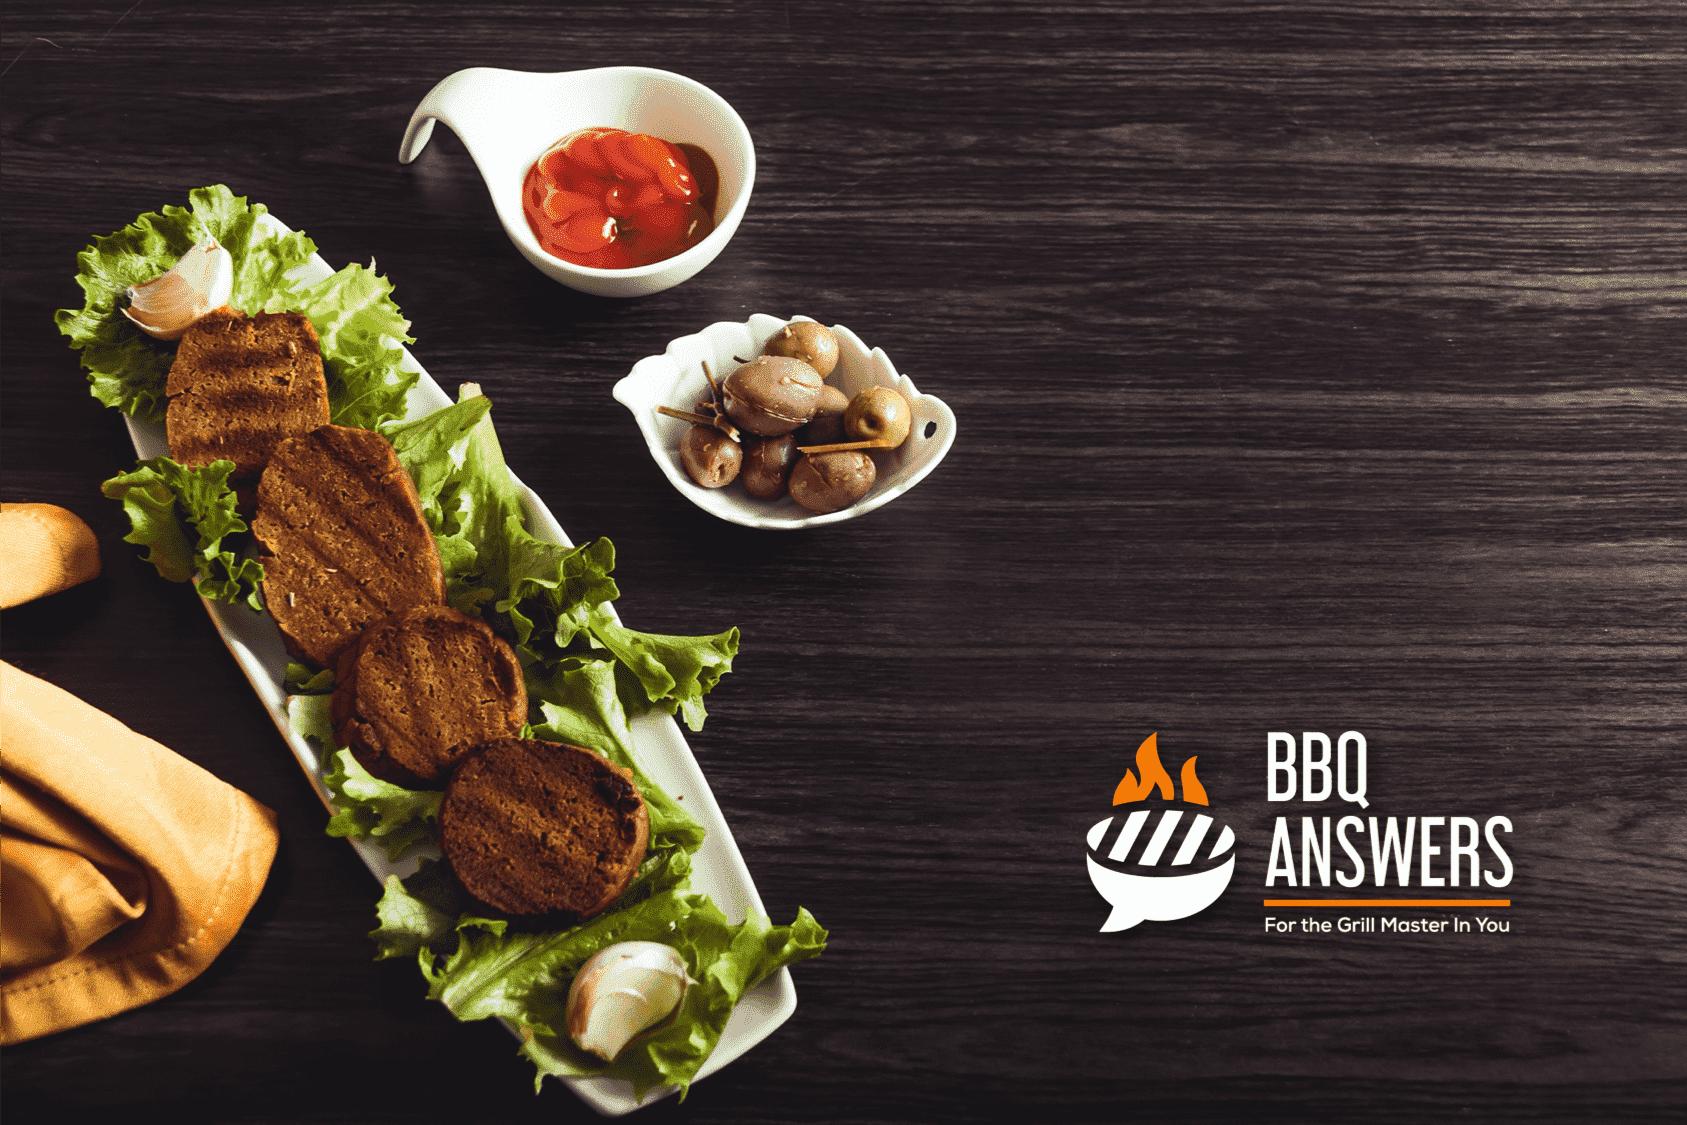 How to Make Vegan BBQ Chicken? (Using Seitan)